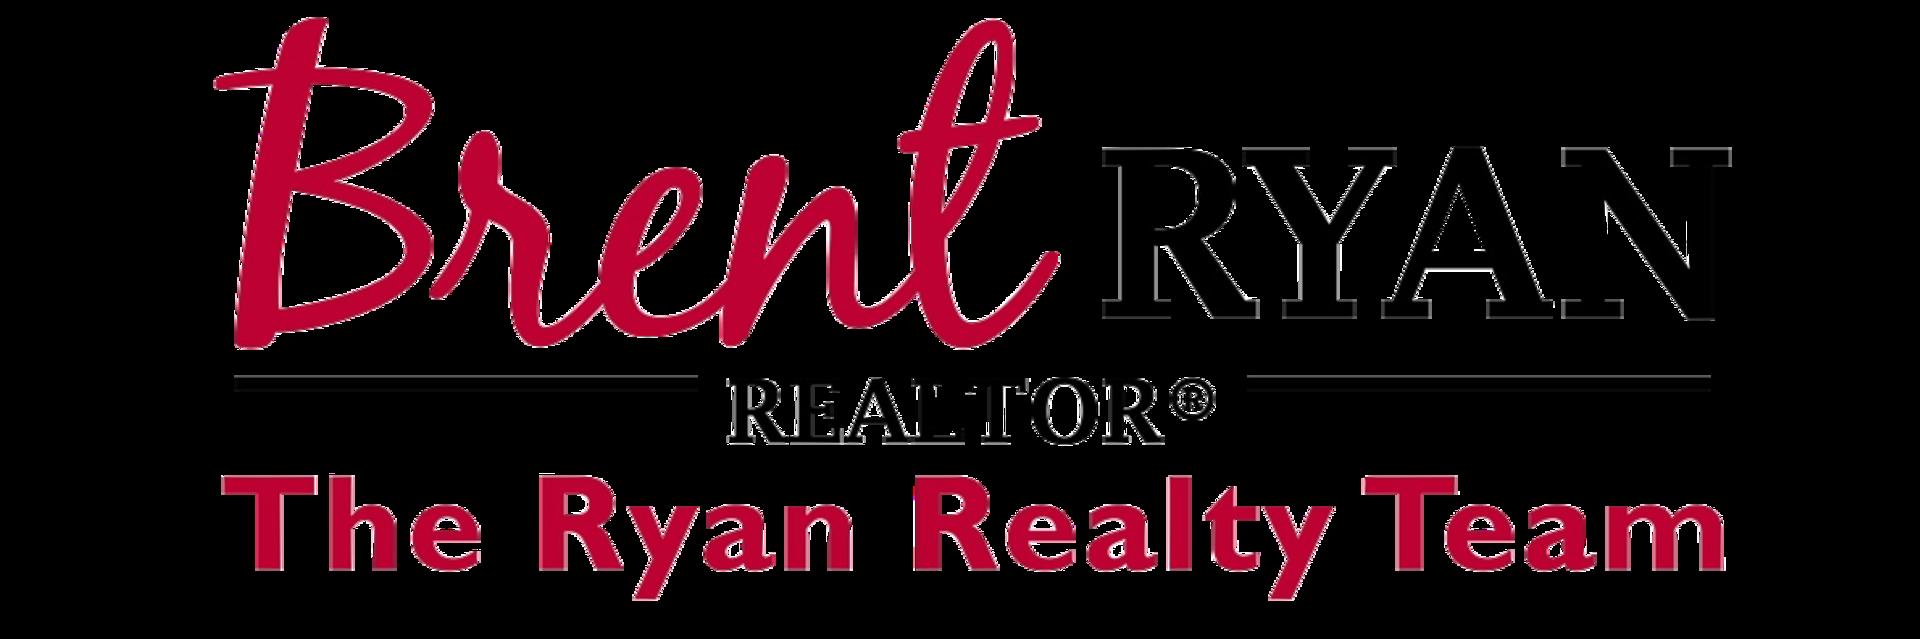 Meet The Ryan Realty Team